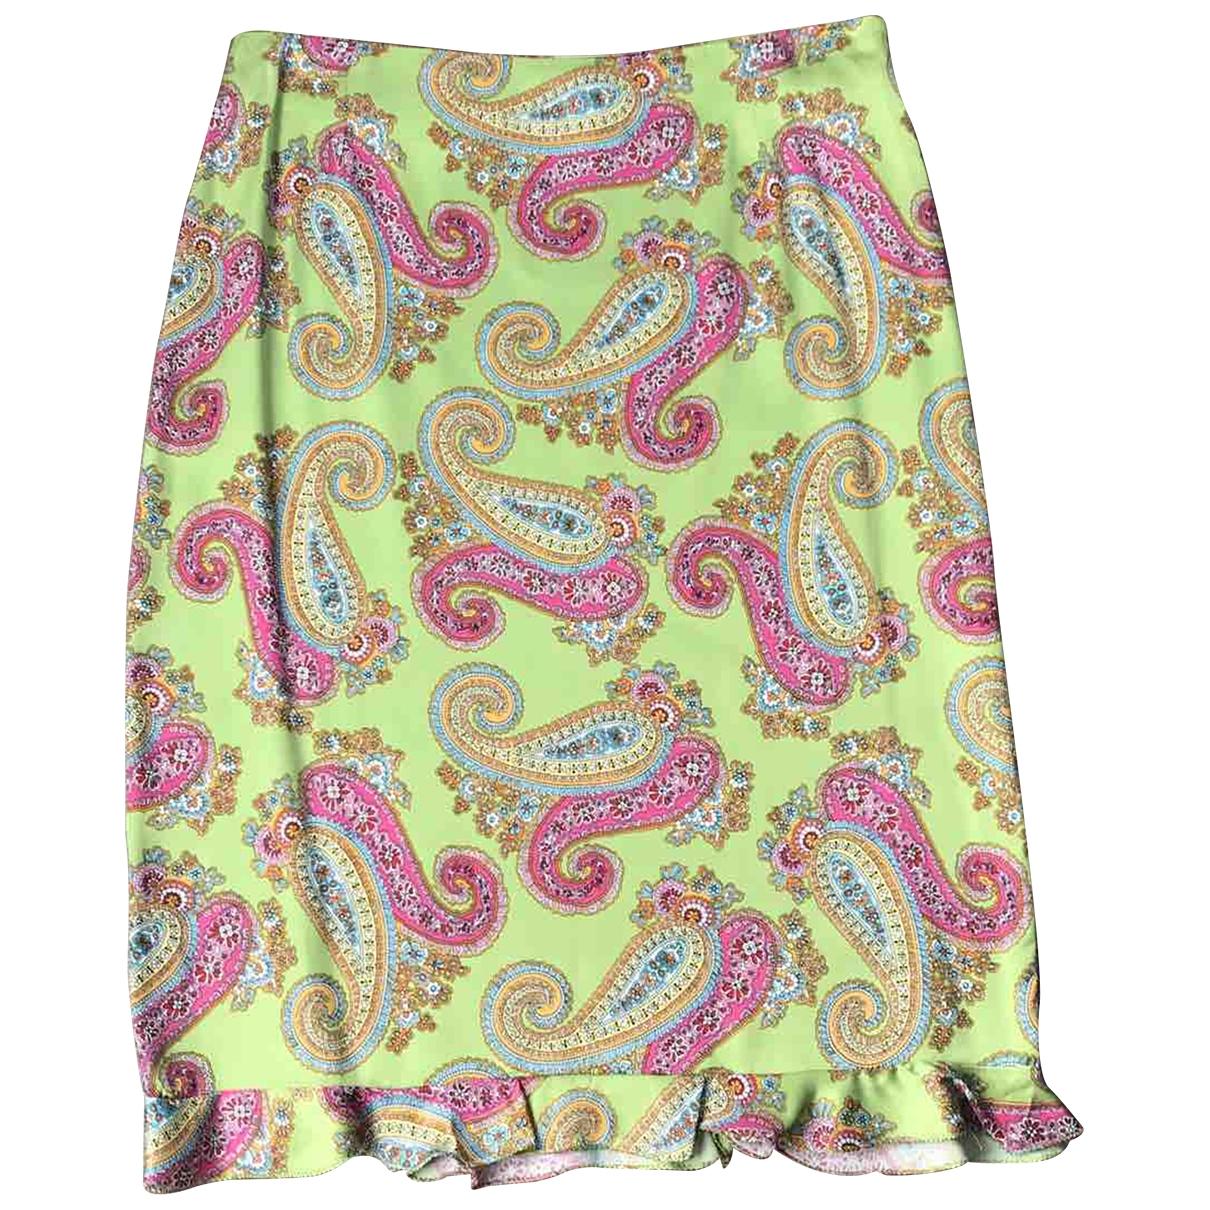 N. Peal - Jupe   pour femme en coton - elasthane - rose